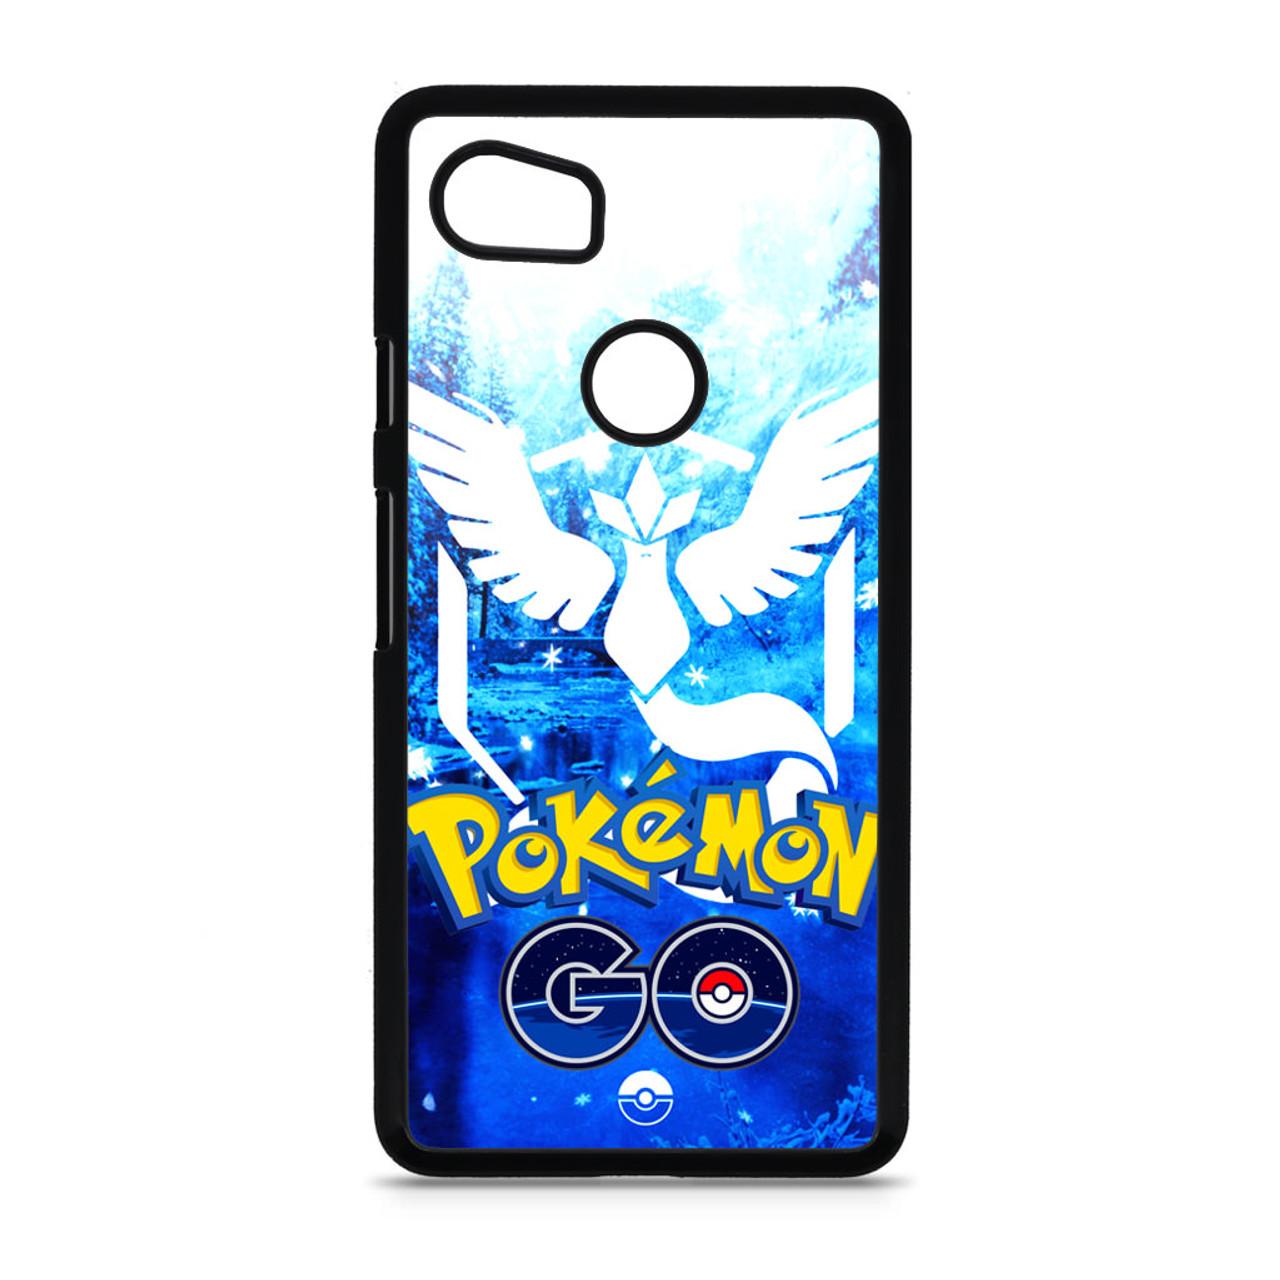 Pokemon Go Mystic Team Google Pixel 2 XL Case - CASESHUNTER